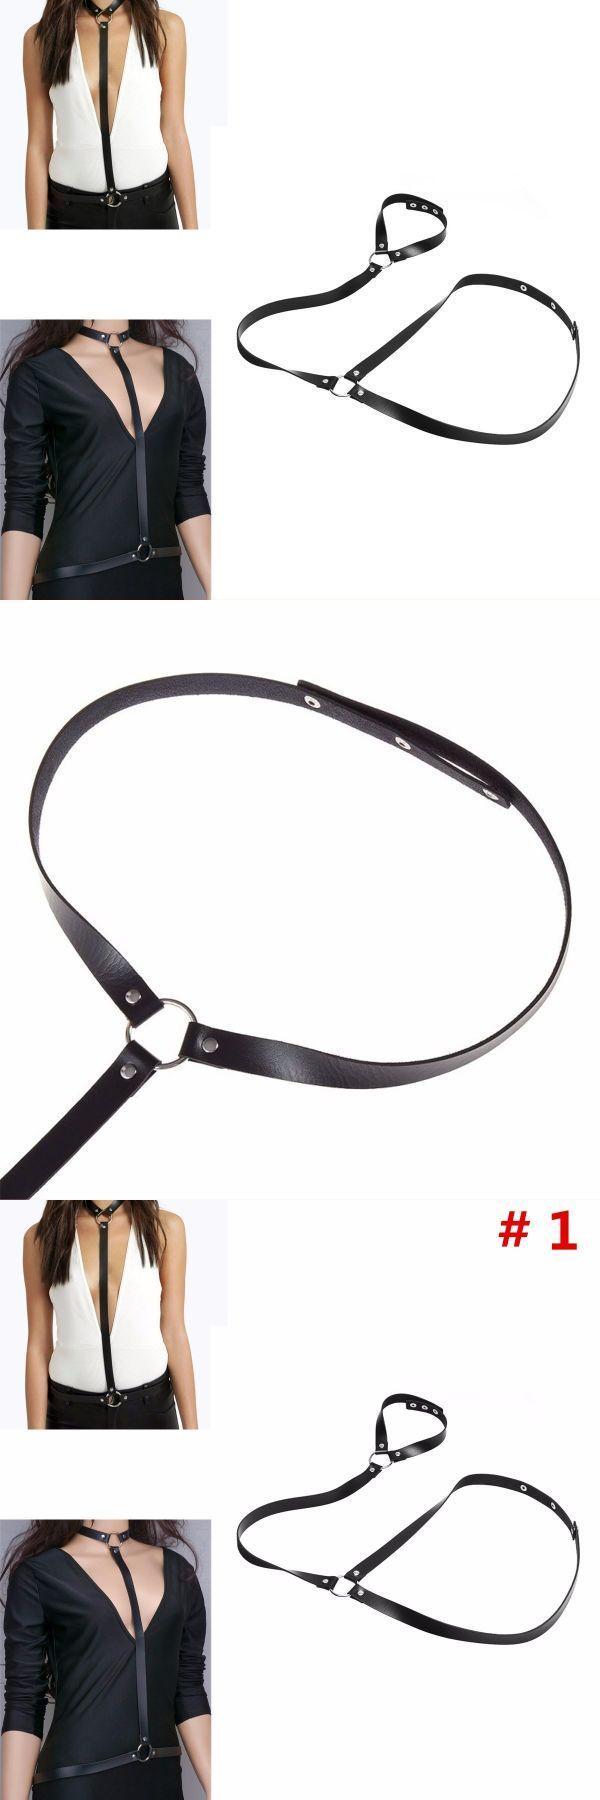 Women sexy black body harness synthetic leather suspenders adjustable harajuku suspenders corset et bustier blanc #bustier #corset #noel #bustier #corset #tops #uk #corset #bustier #top #corset #o #bustier